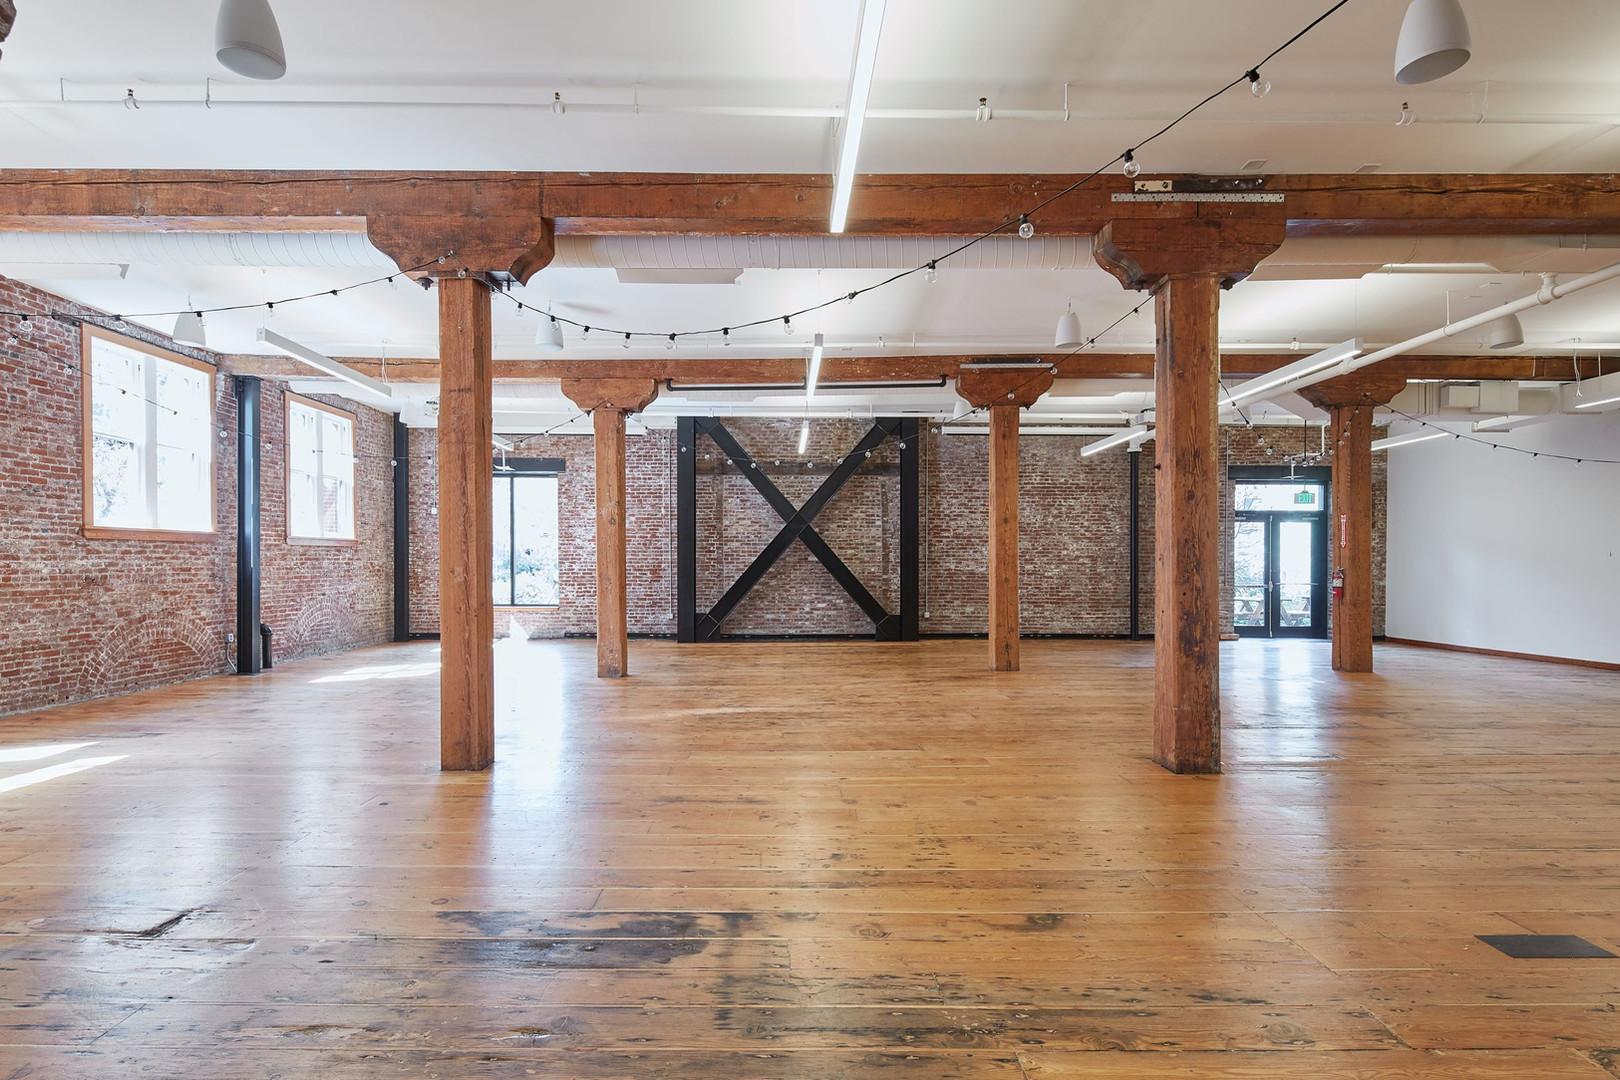 Warm Wood Floors of the Irving Street Studio